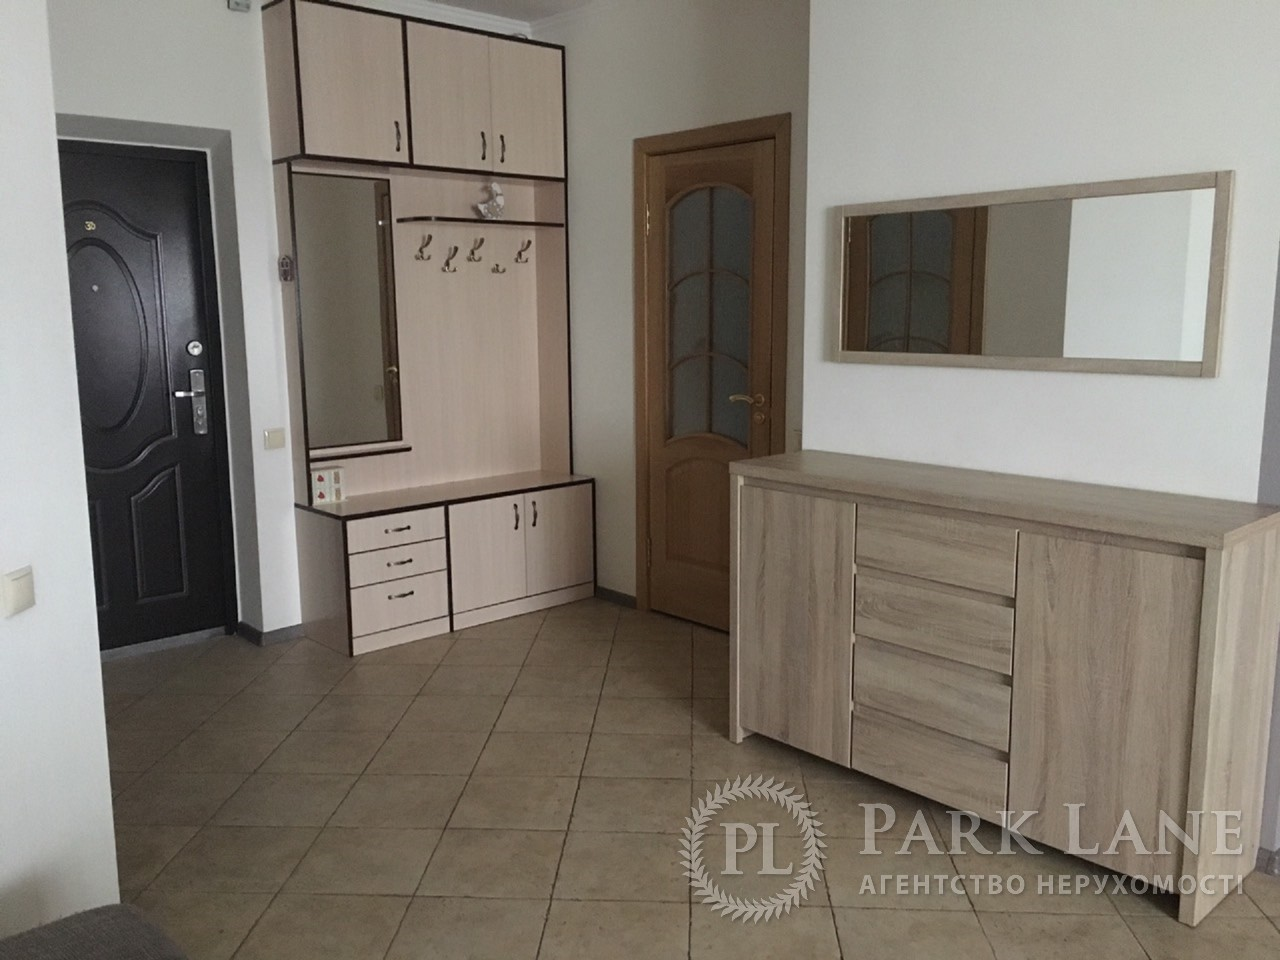 Квартира ул. Иорданская (Гавро Лайоша), 1, Киев, Z-275930 - Фото 9